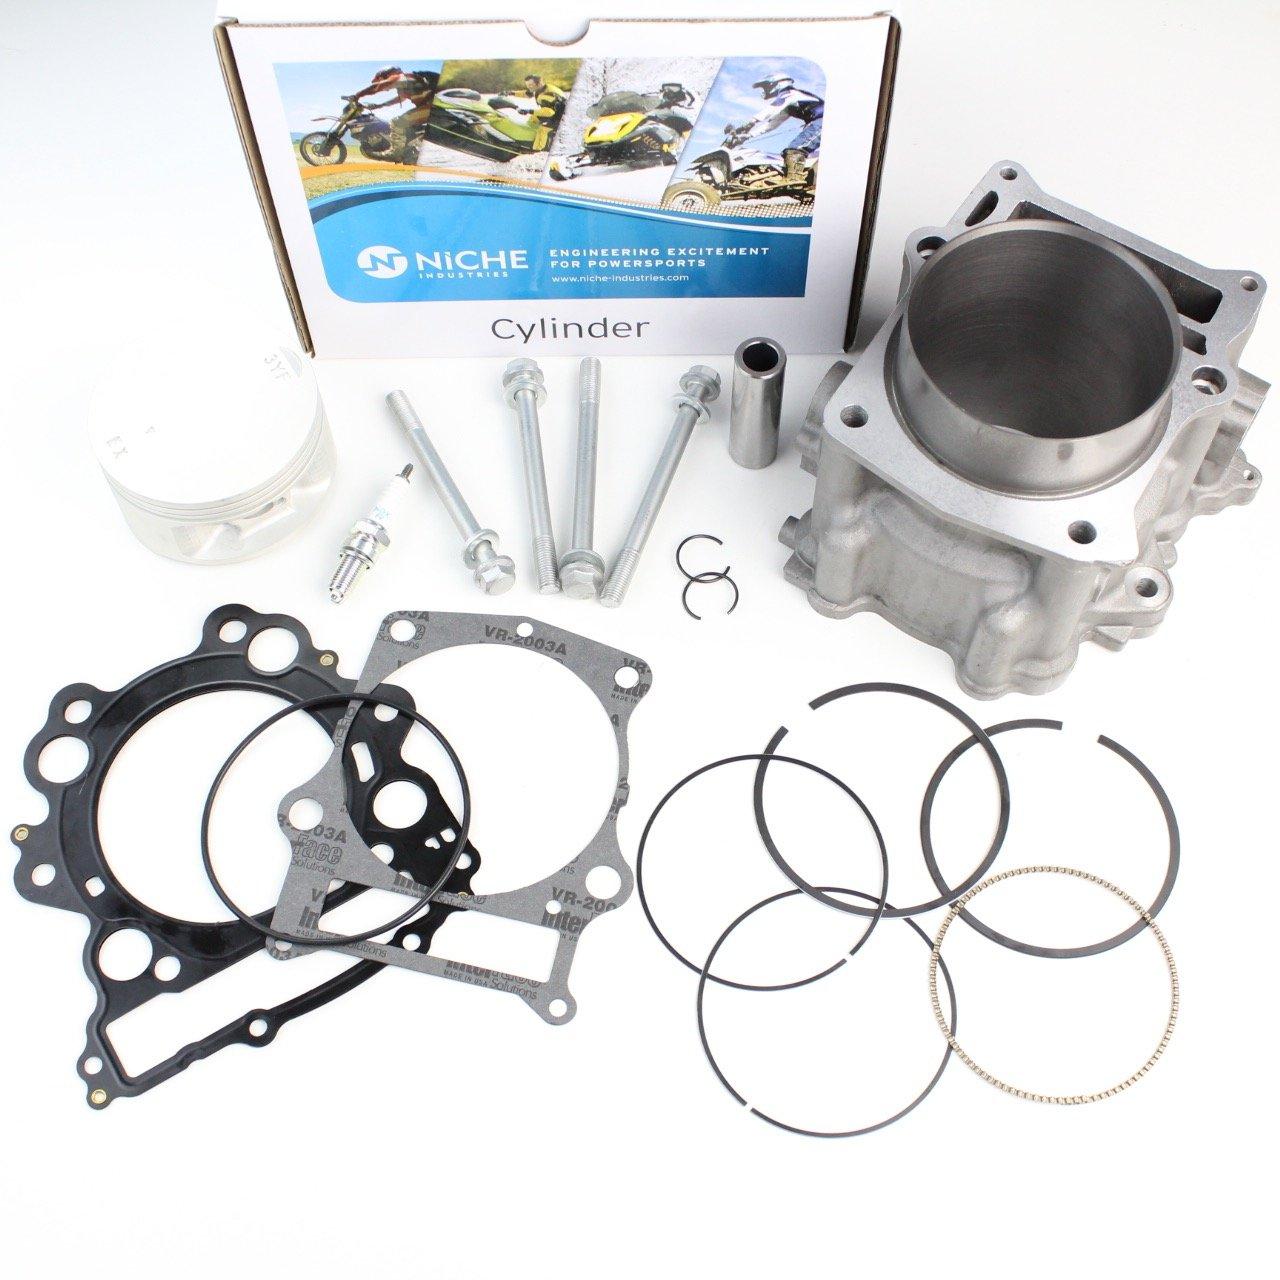 Niche Industries 1810 Yamaha Rhino 660 Cylinder Piston Gasket Top End Rebuild Kit 2004-2007